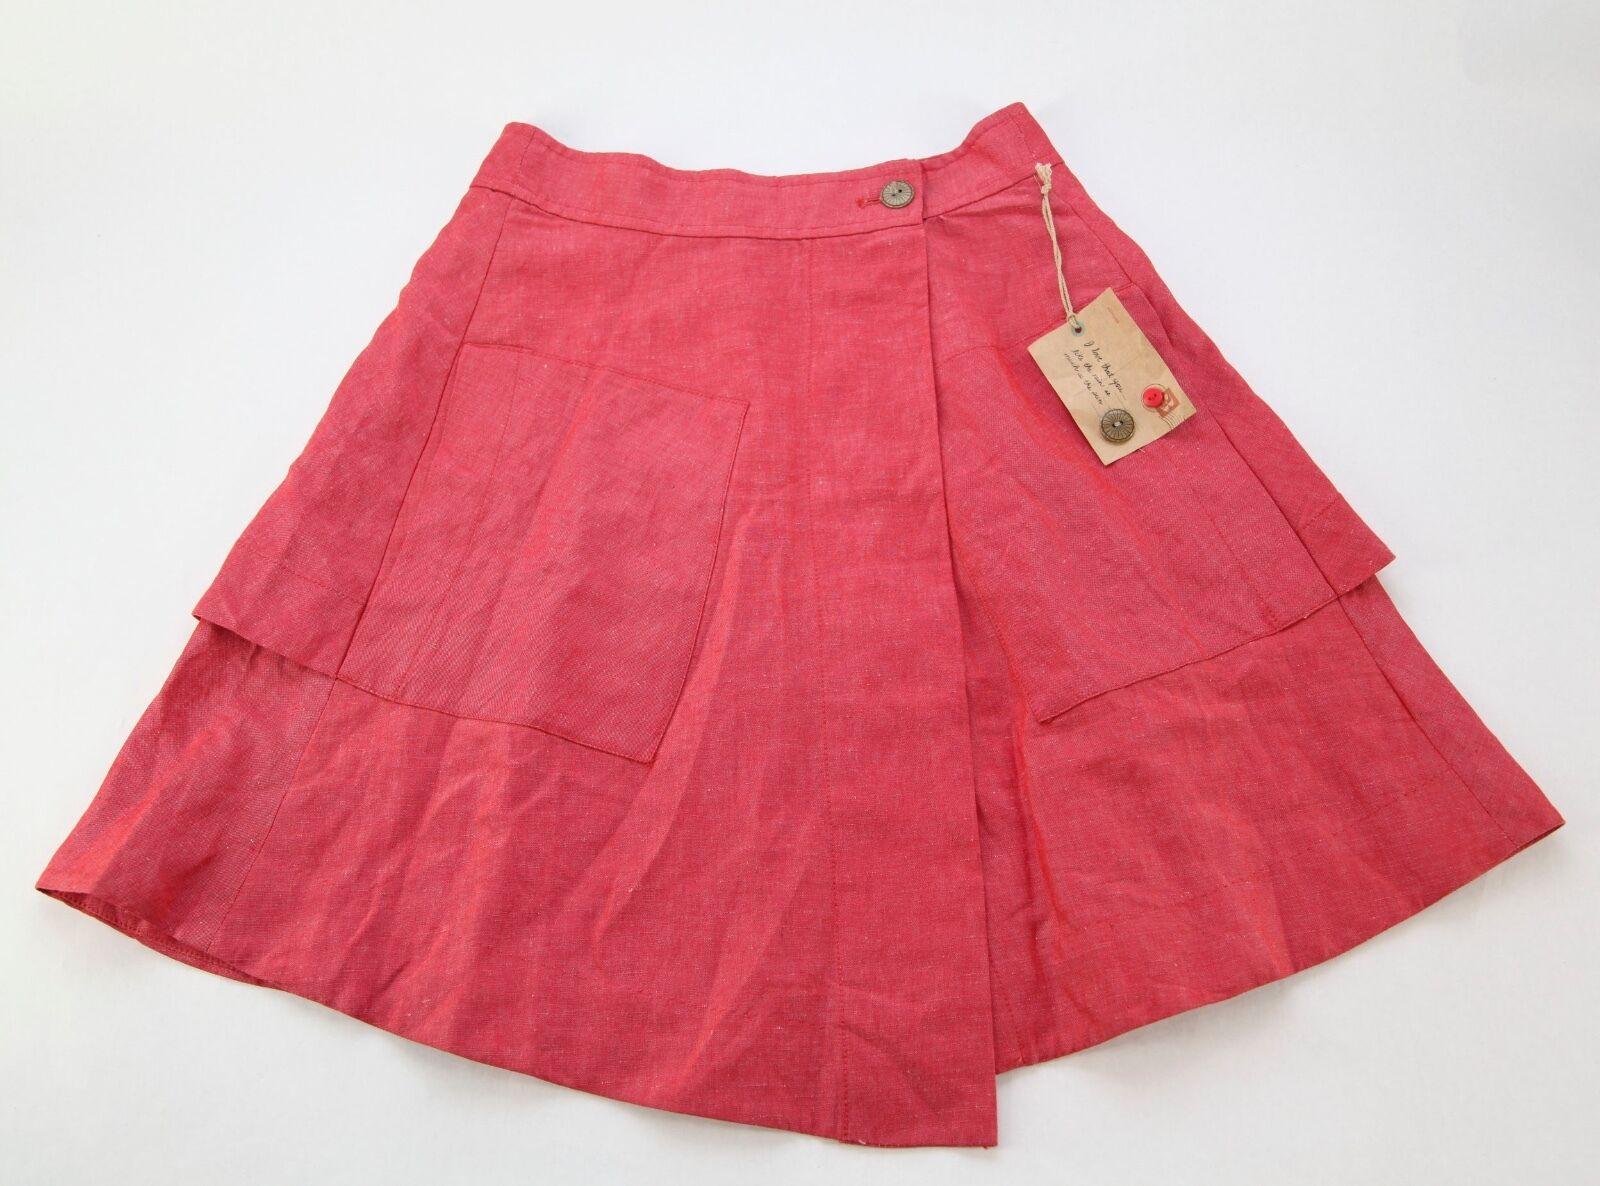 NEW w tags AnthGoldpologie rot Linen Silk Blend A Line Rock Größe 6P